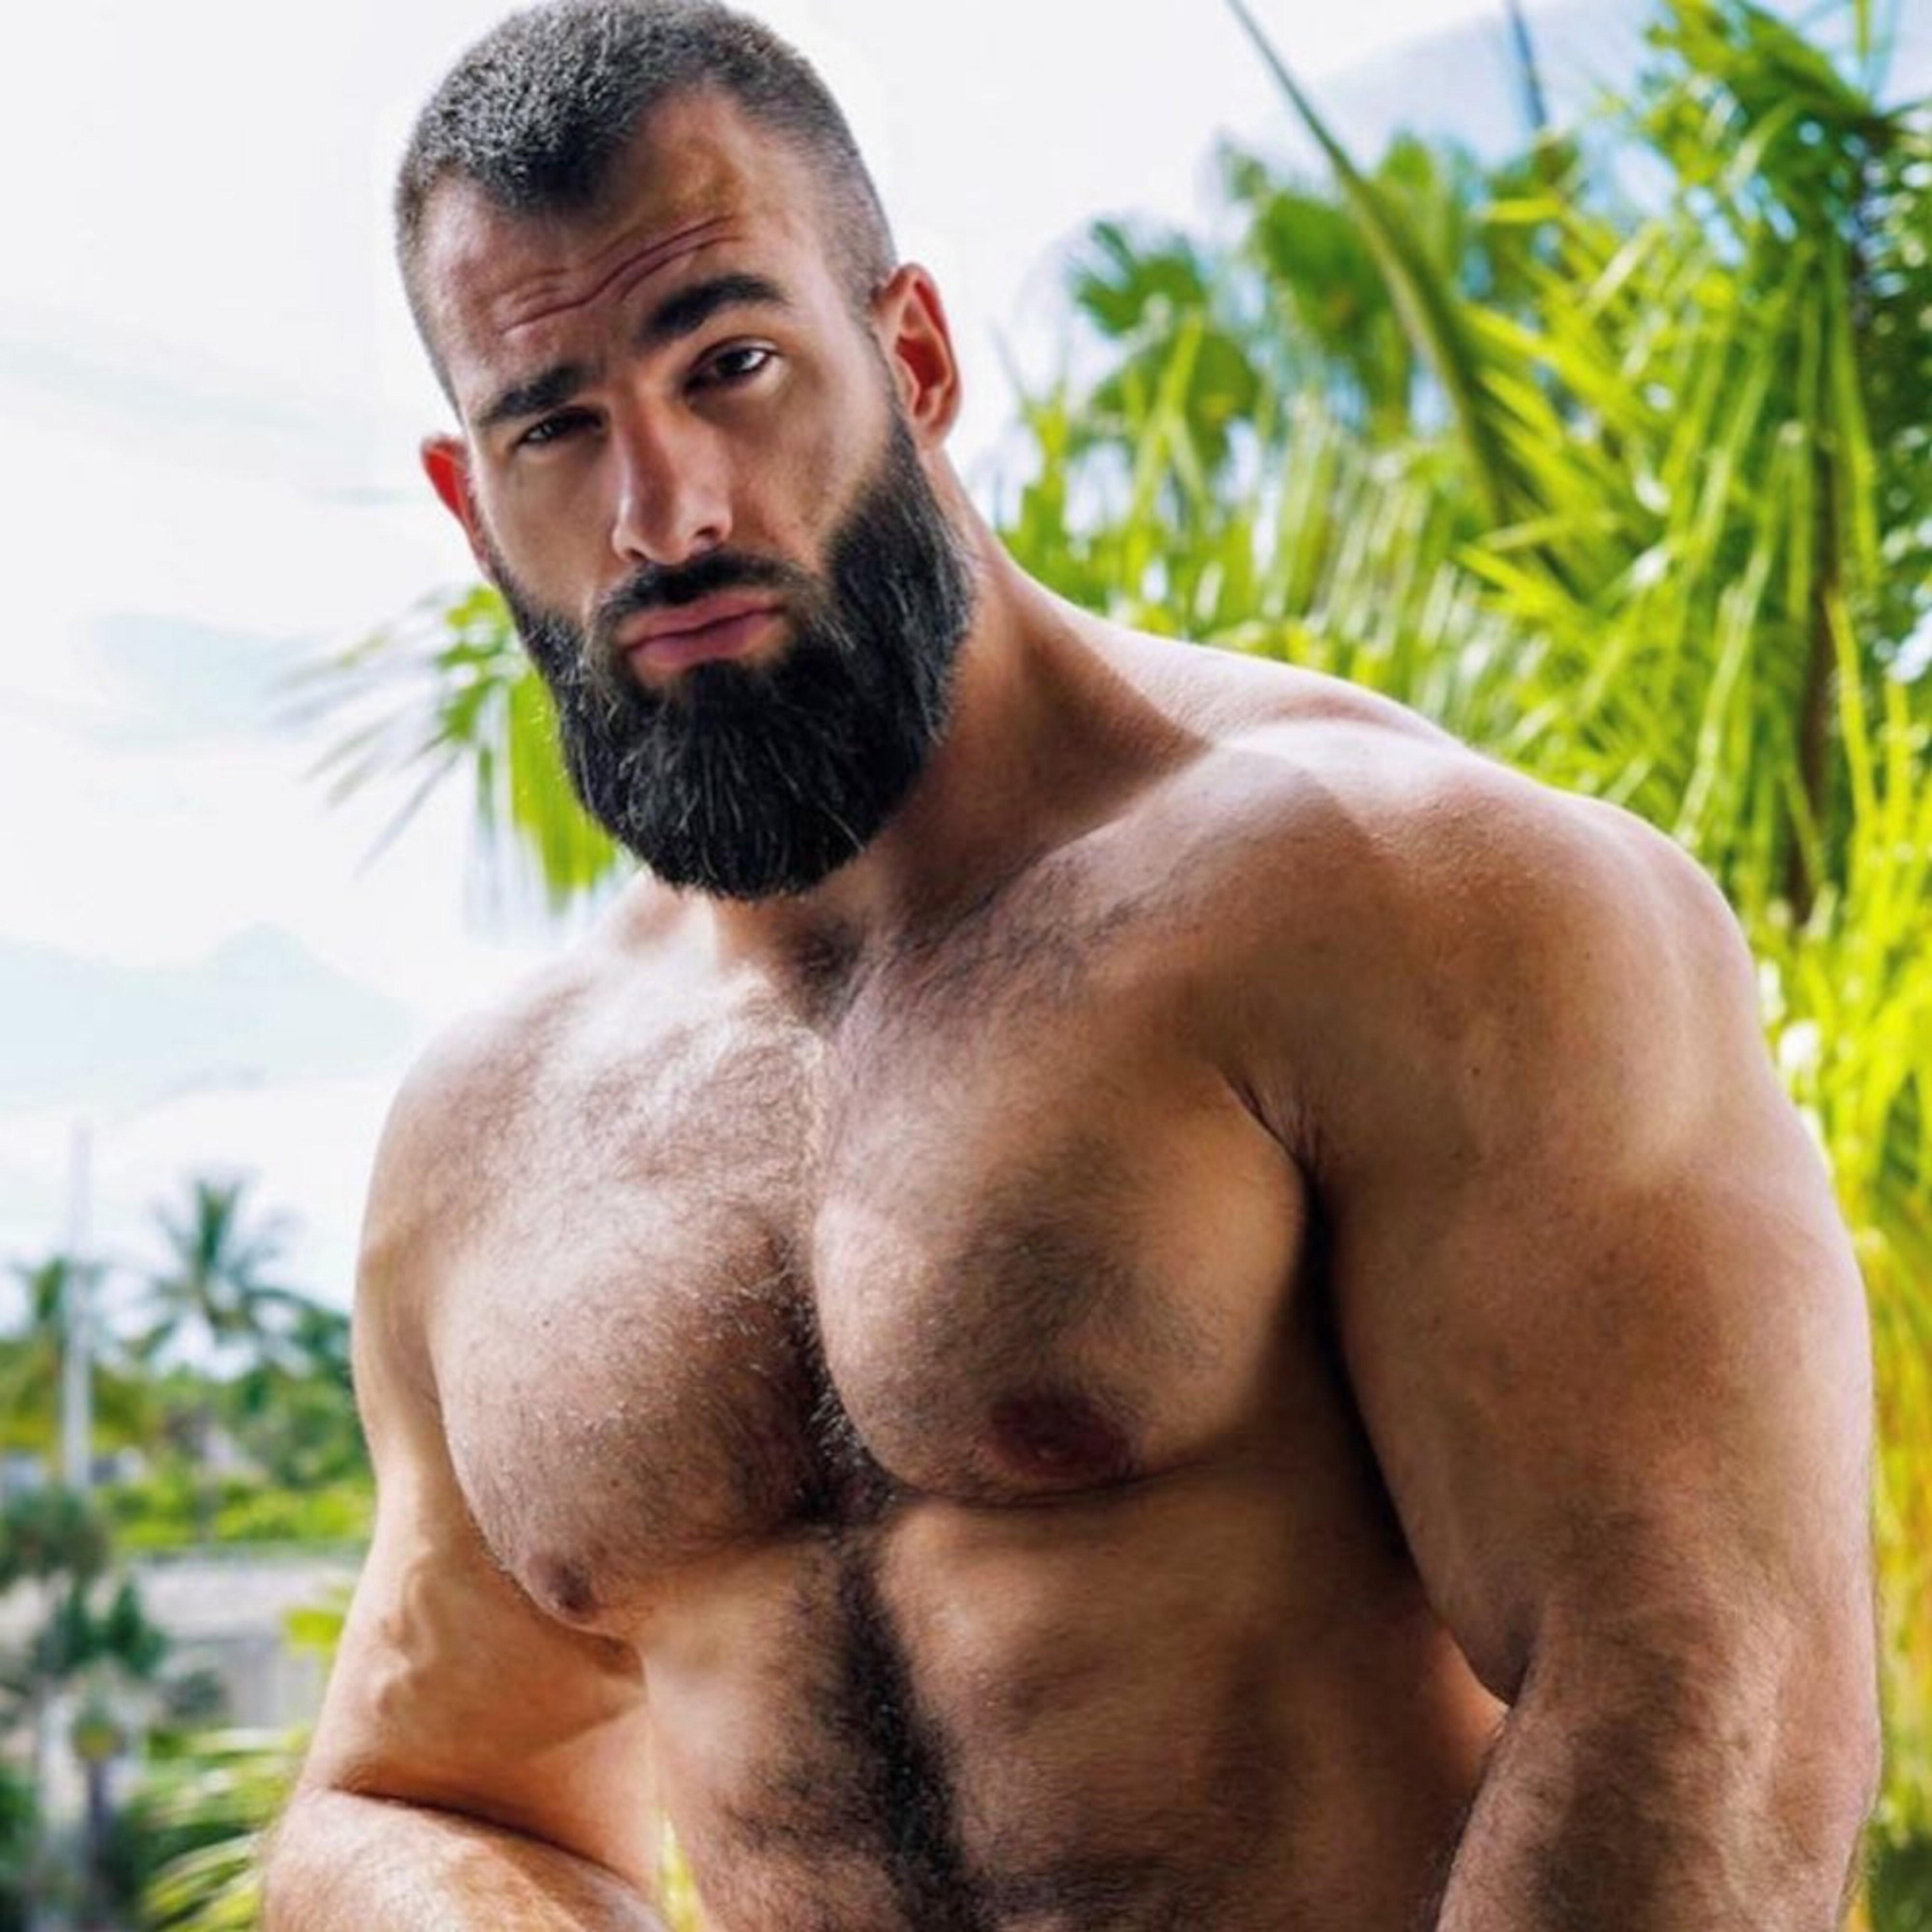 A long beard for men with an oval face shape.